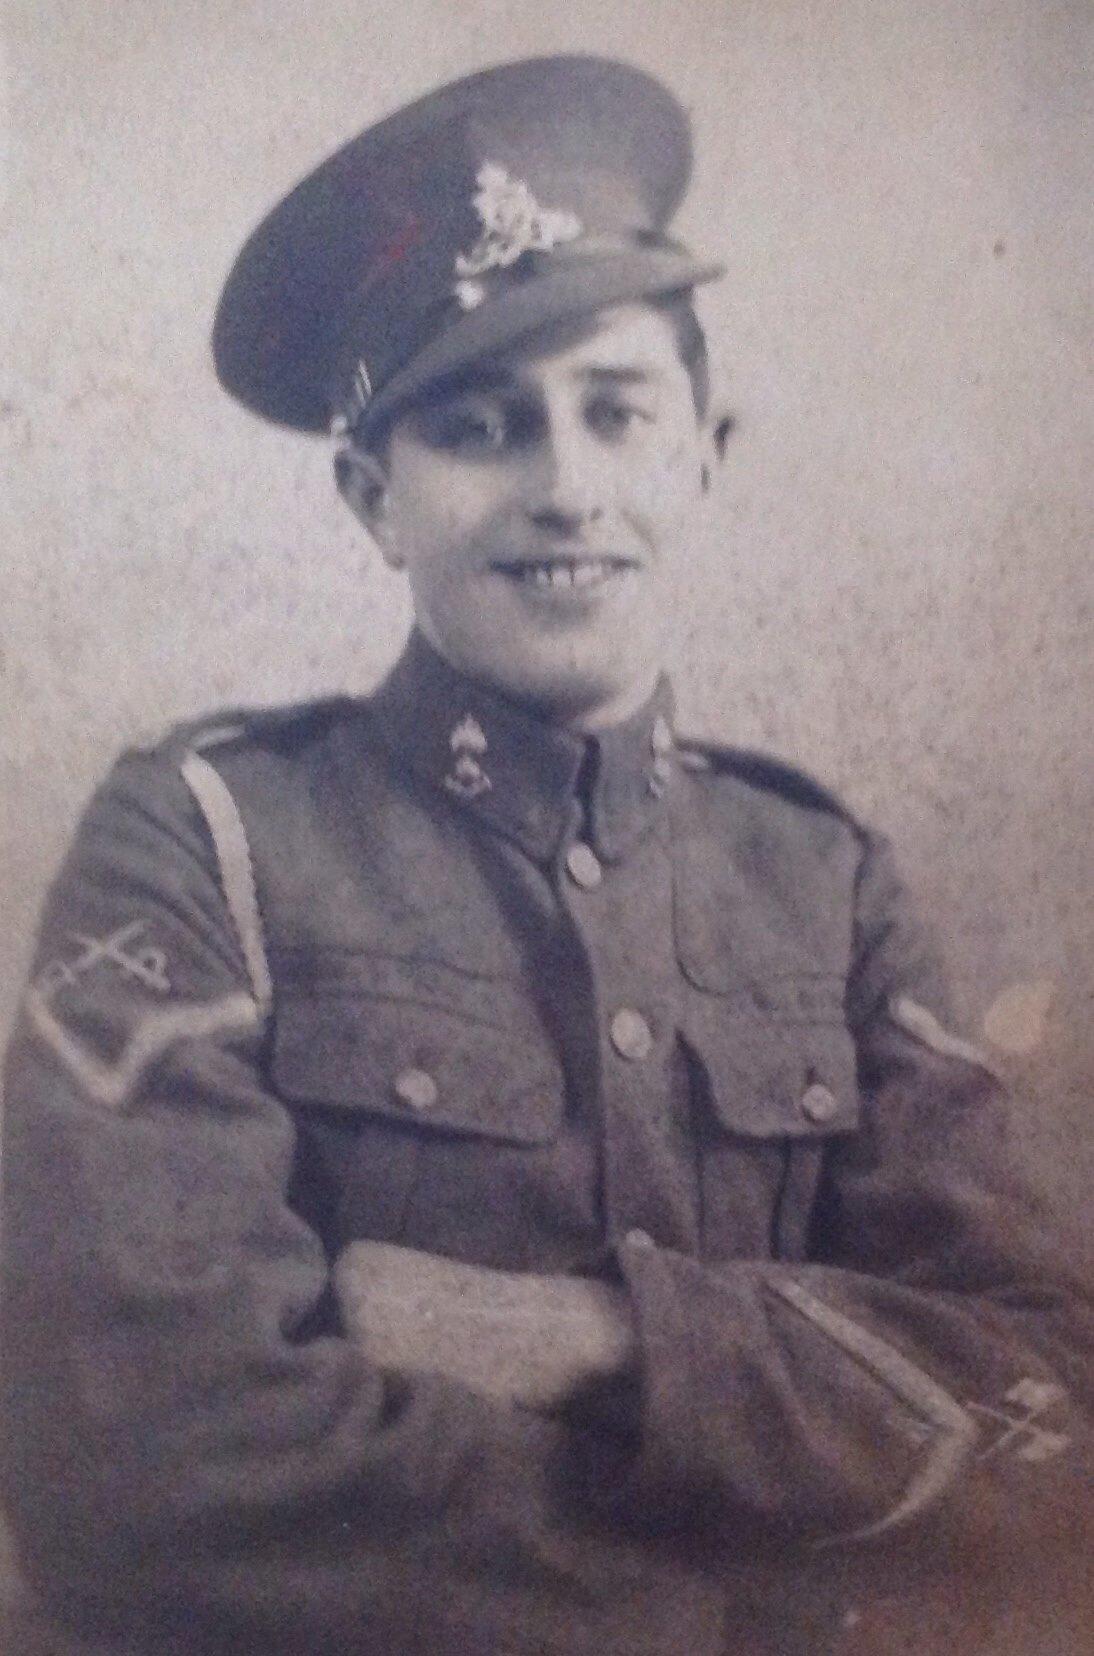 A Tribute to My Great Granddad – Thomas Lusitania Smith, 1918-2015